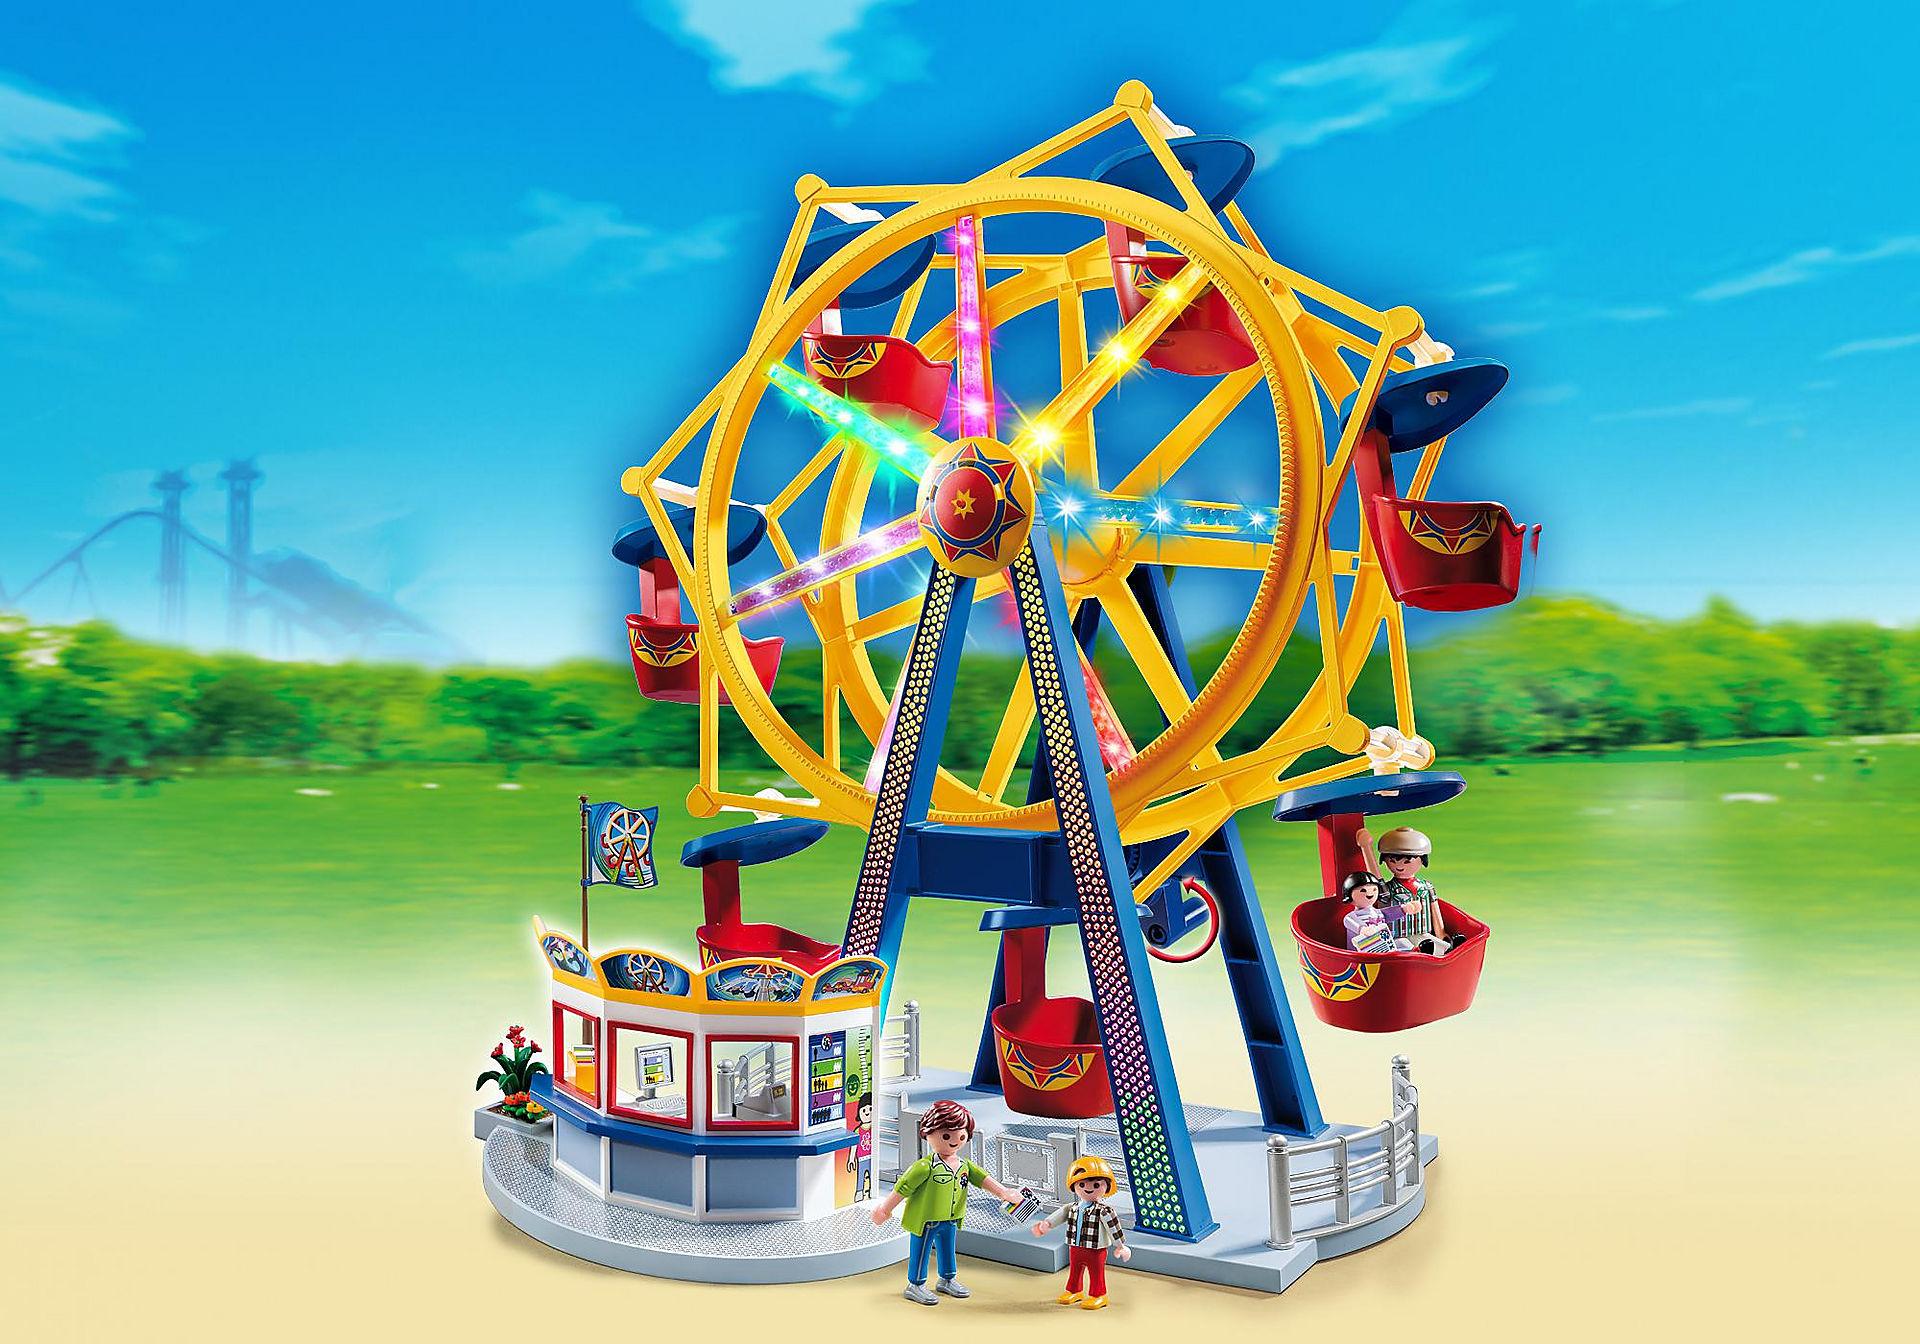 http://media.playmobil.com/i/playmobil/5552_product_detail/Ferris Wheel with Lights